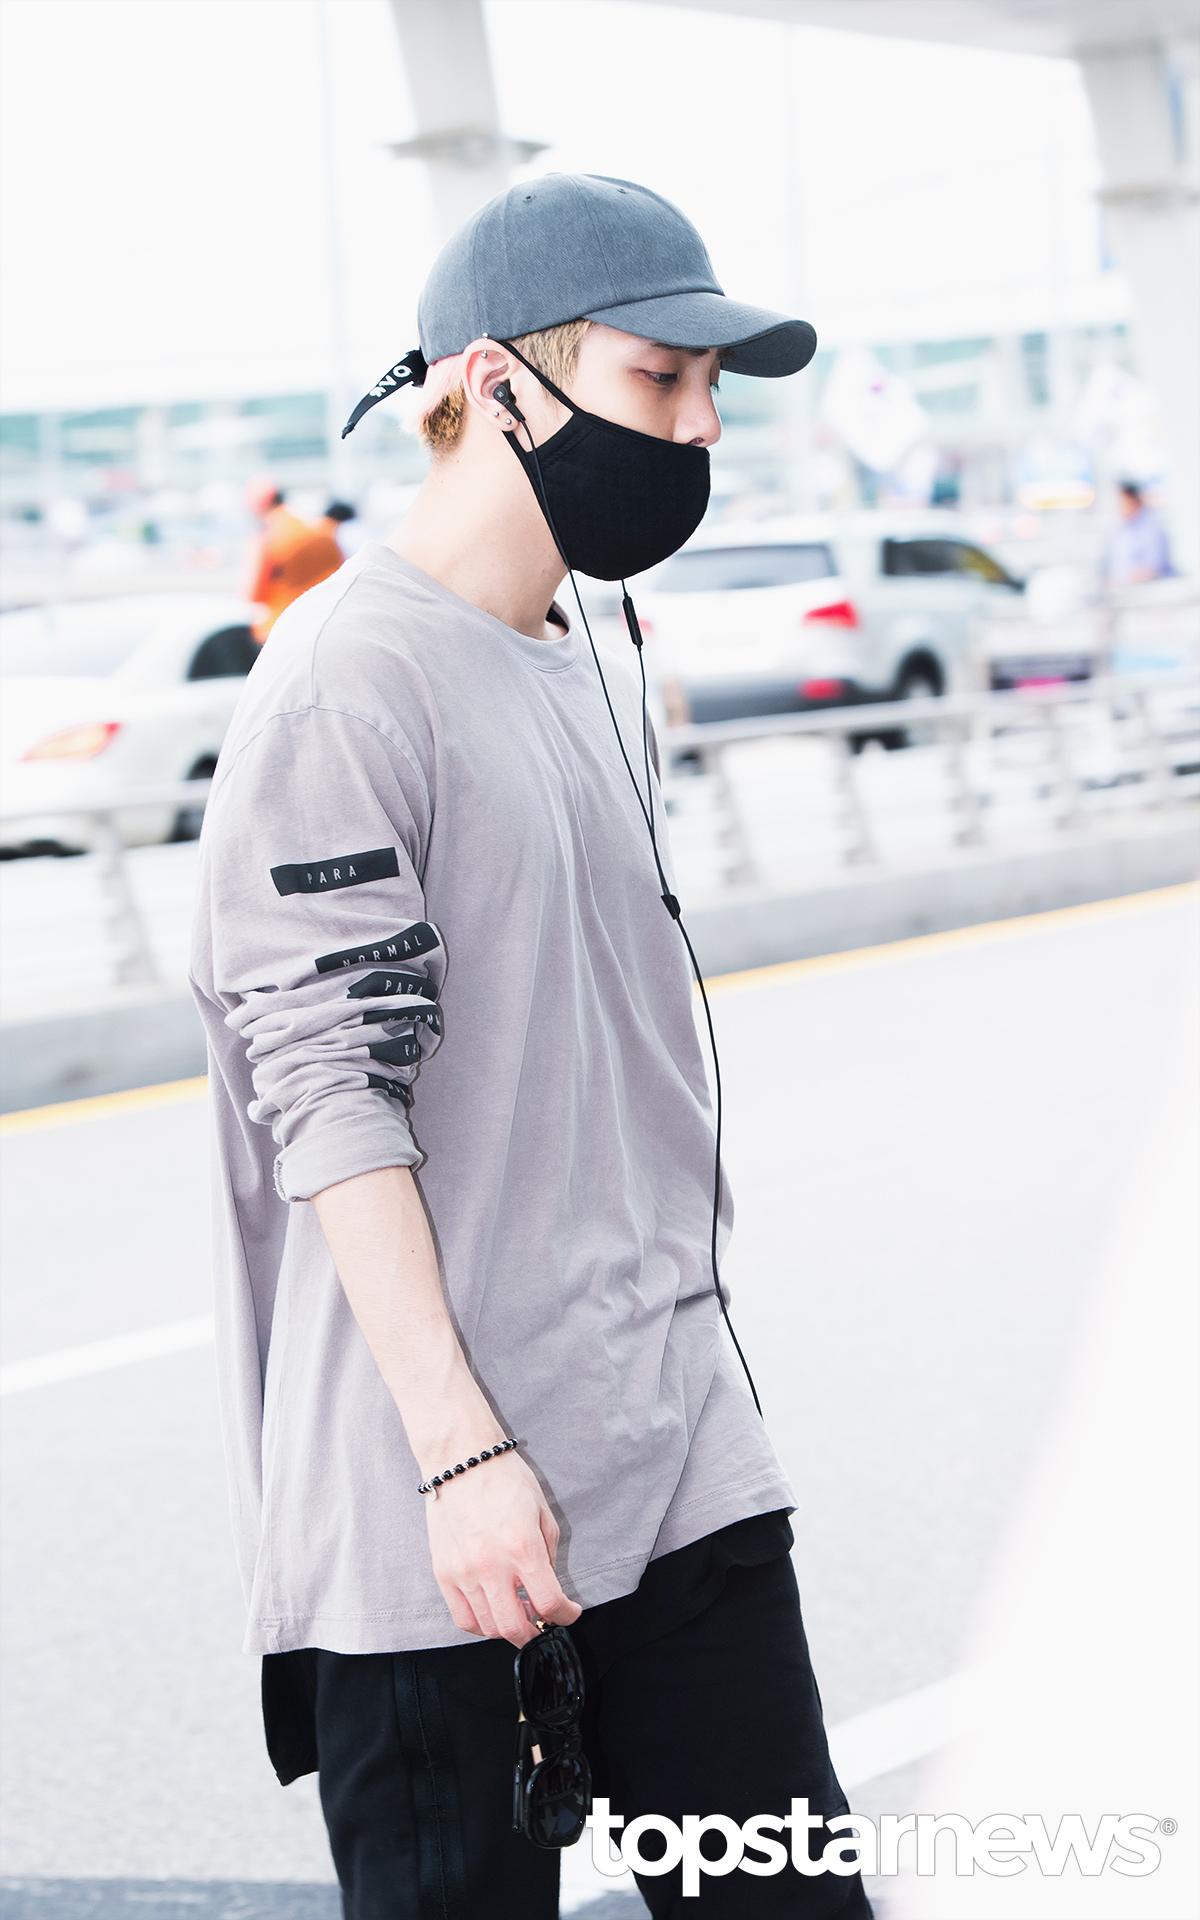 [IMG/160715] Jonghyun, Key @ Aeropuerto Incheon hacia Japón. HHrnRc8B